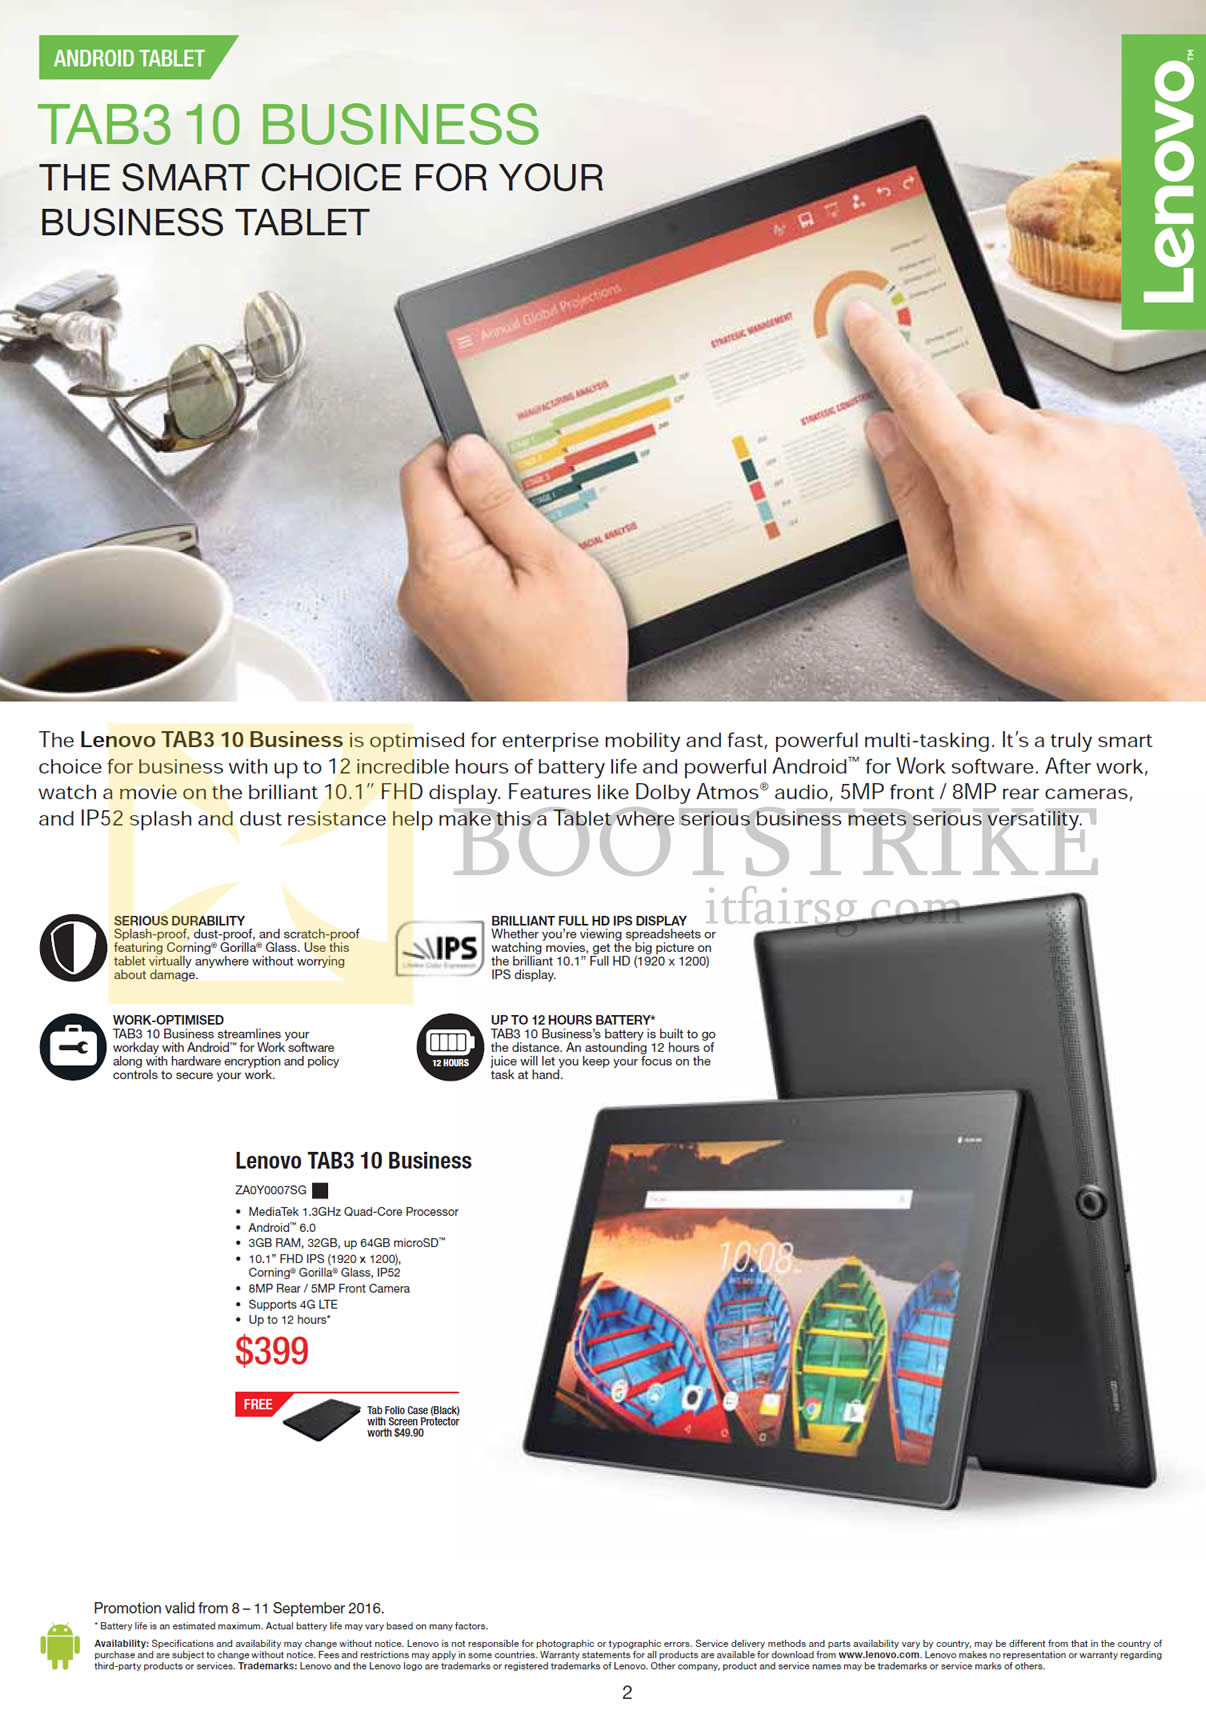 COMEX 2016 price list image brochure of Lenovo Tablet Tab3 10 Business